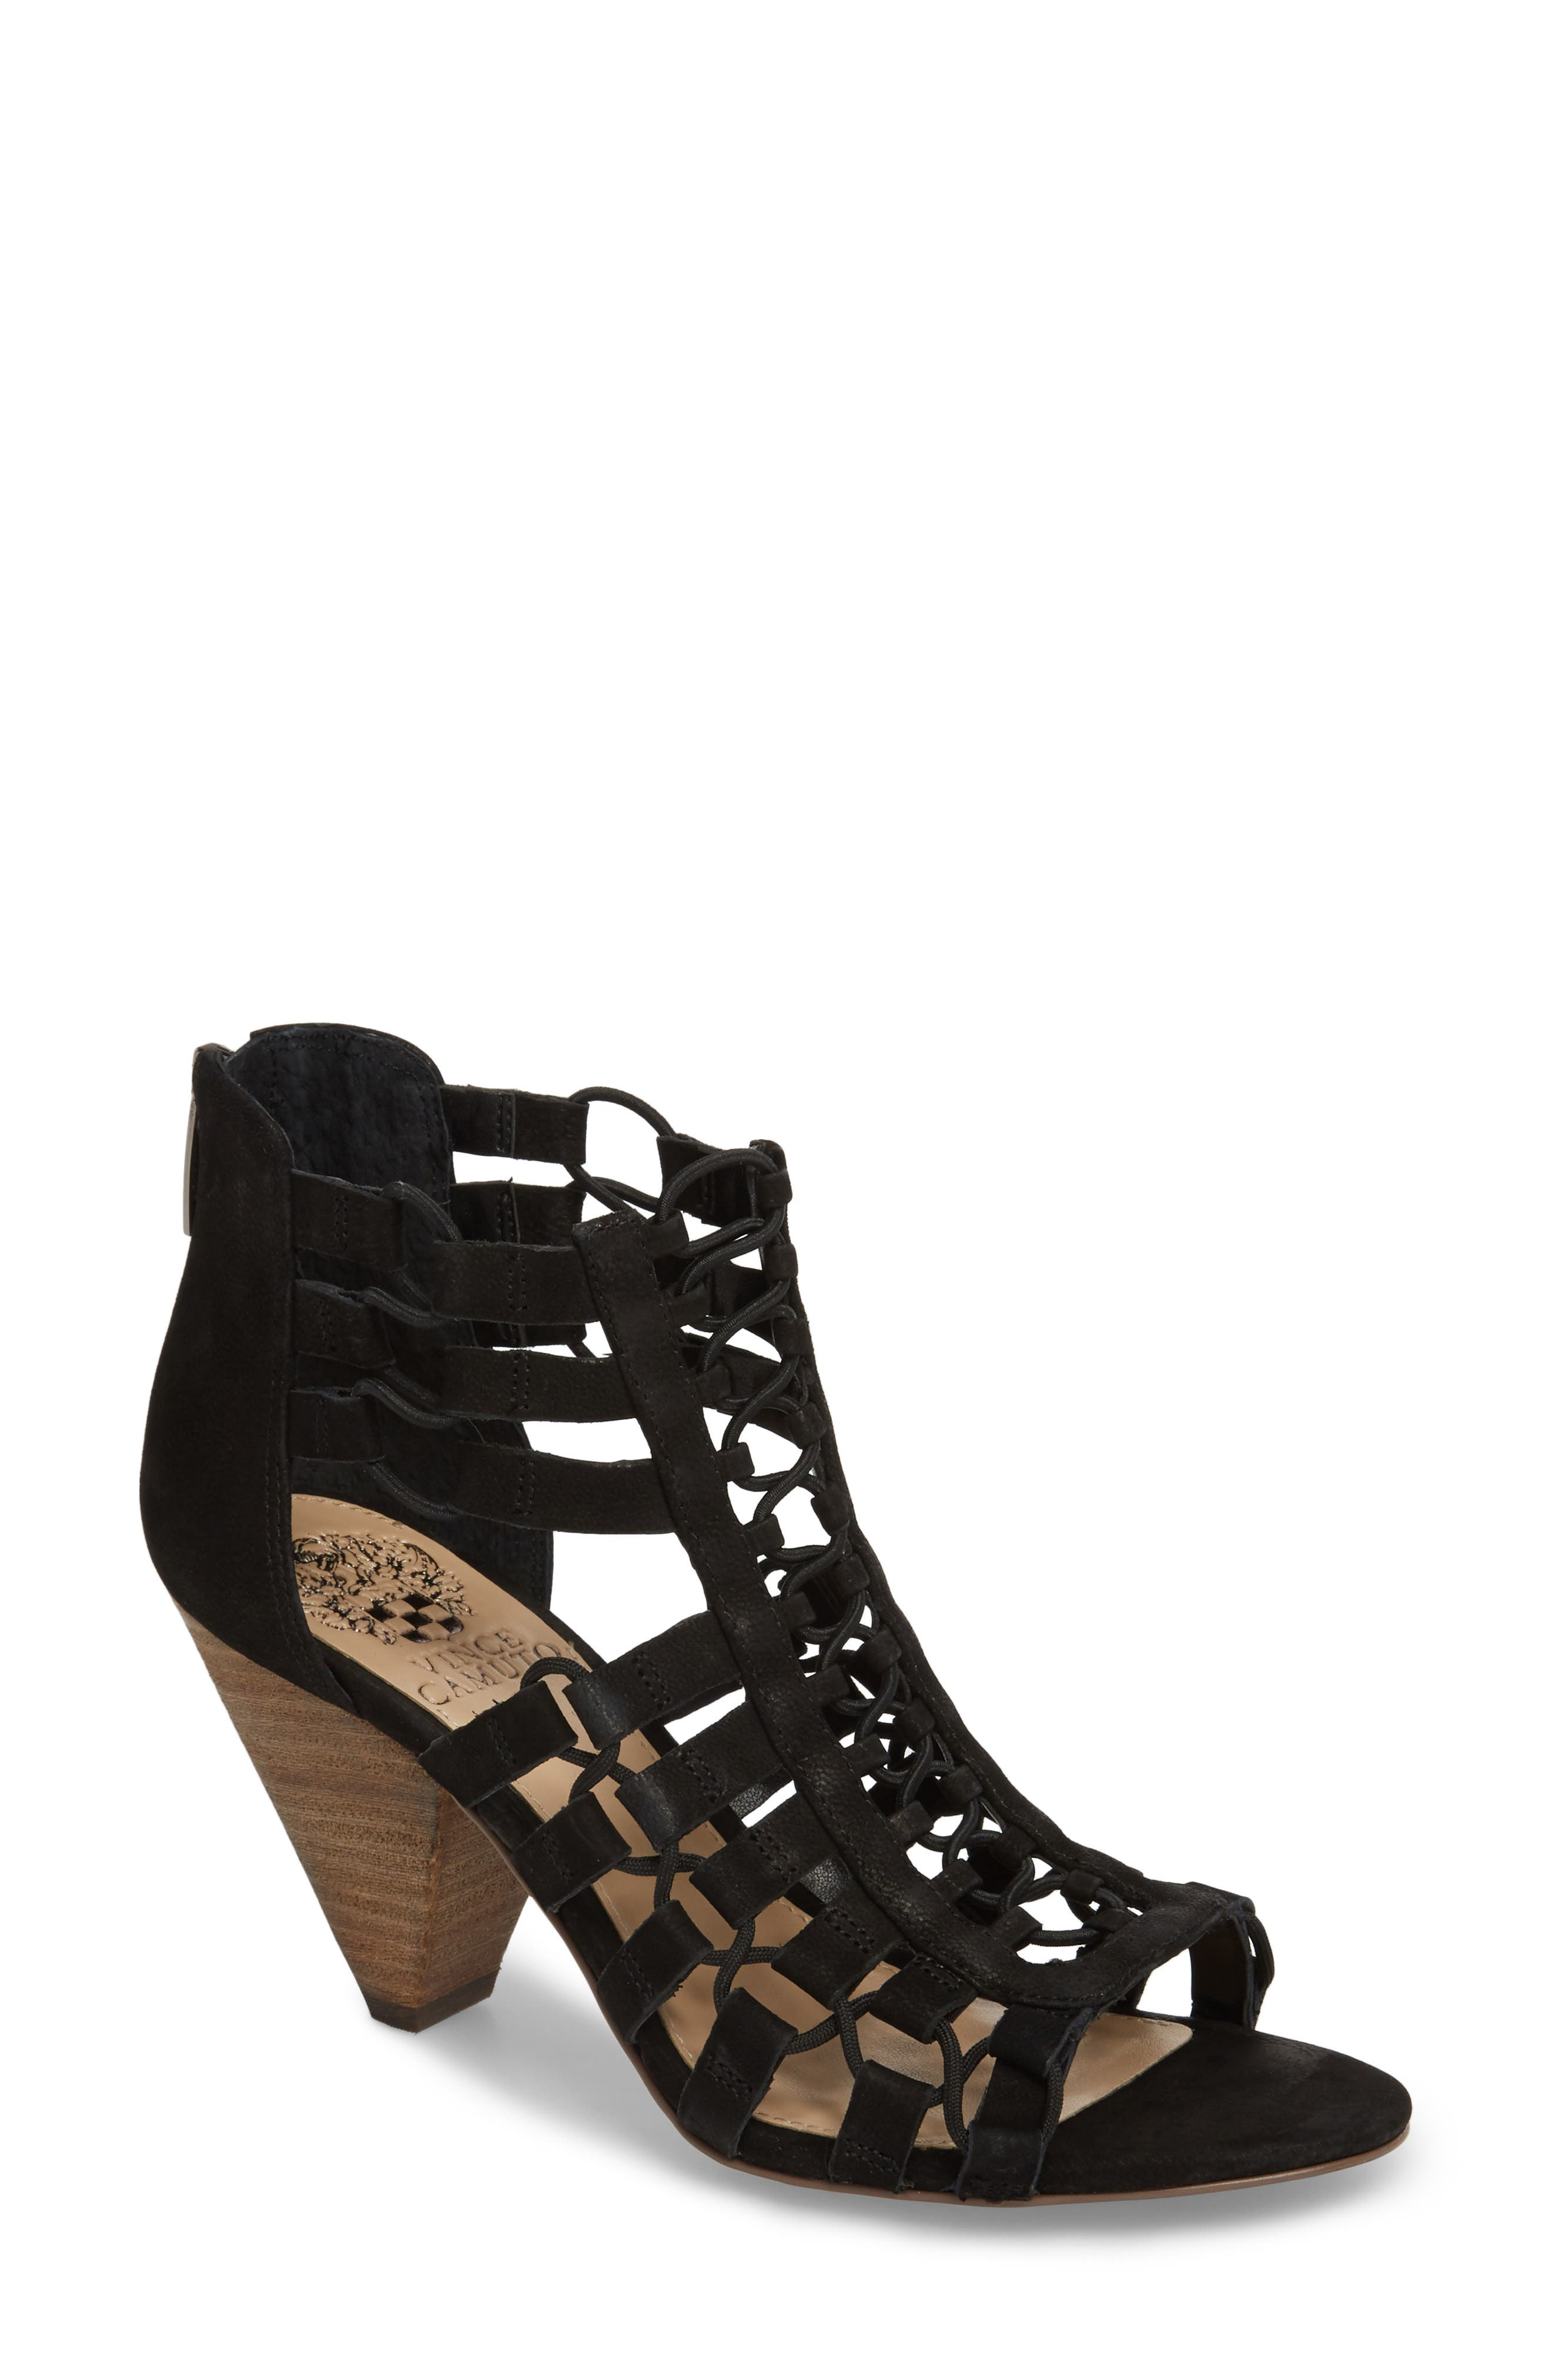 Elanso Sandal,                         Main,                         color, Black Leather